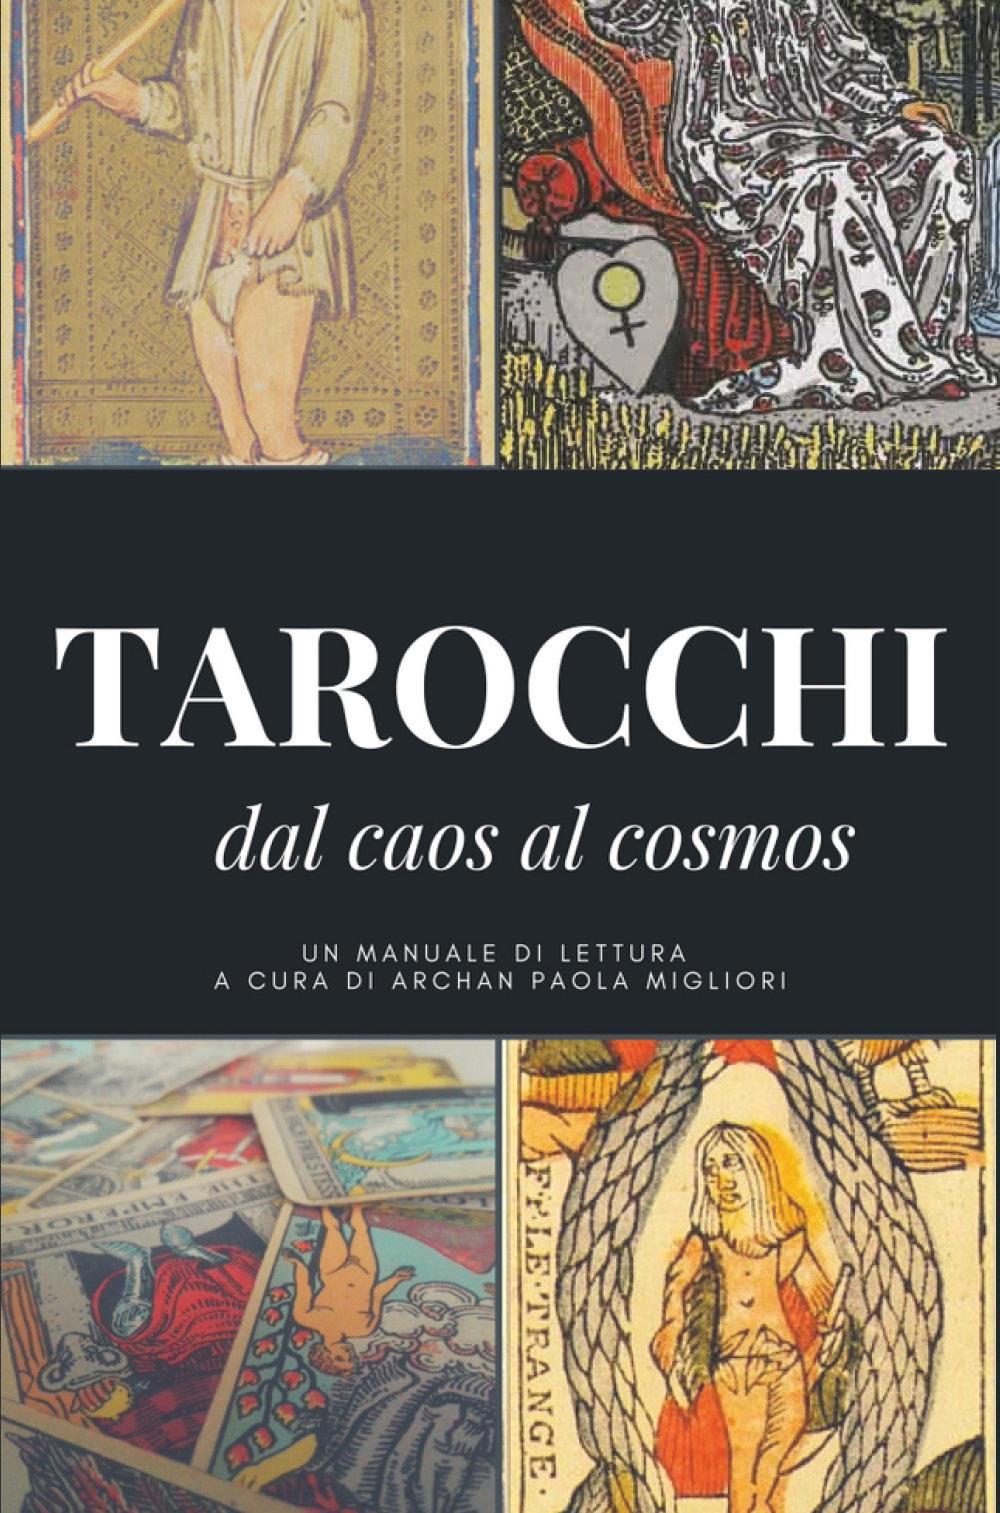 I Tarocchi: dal caos al cosmos